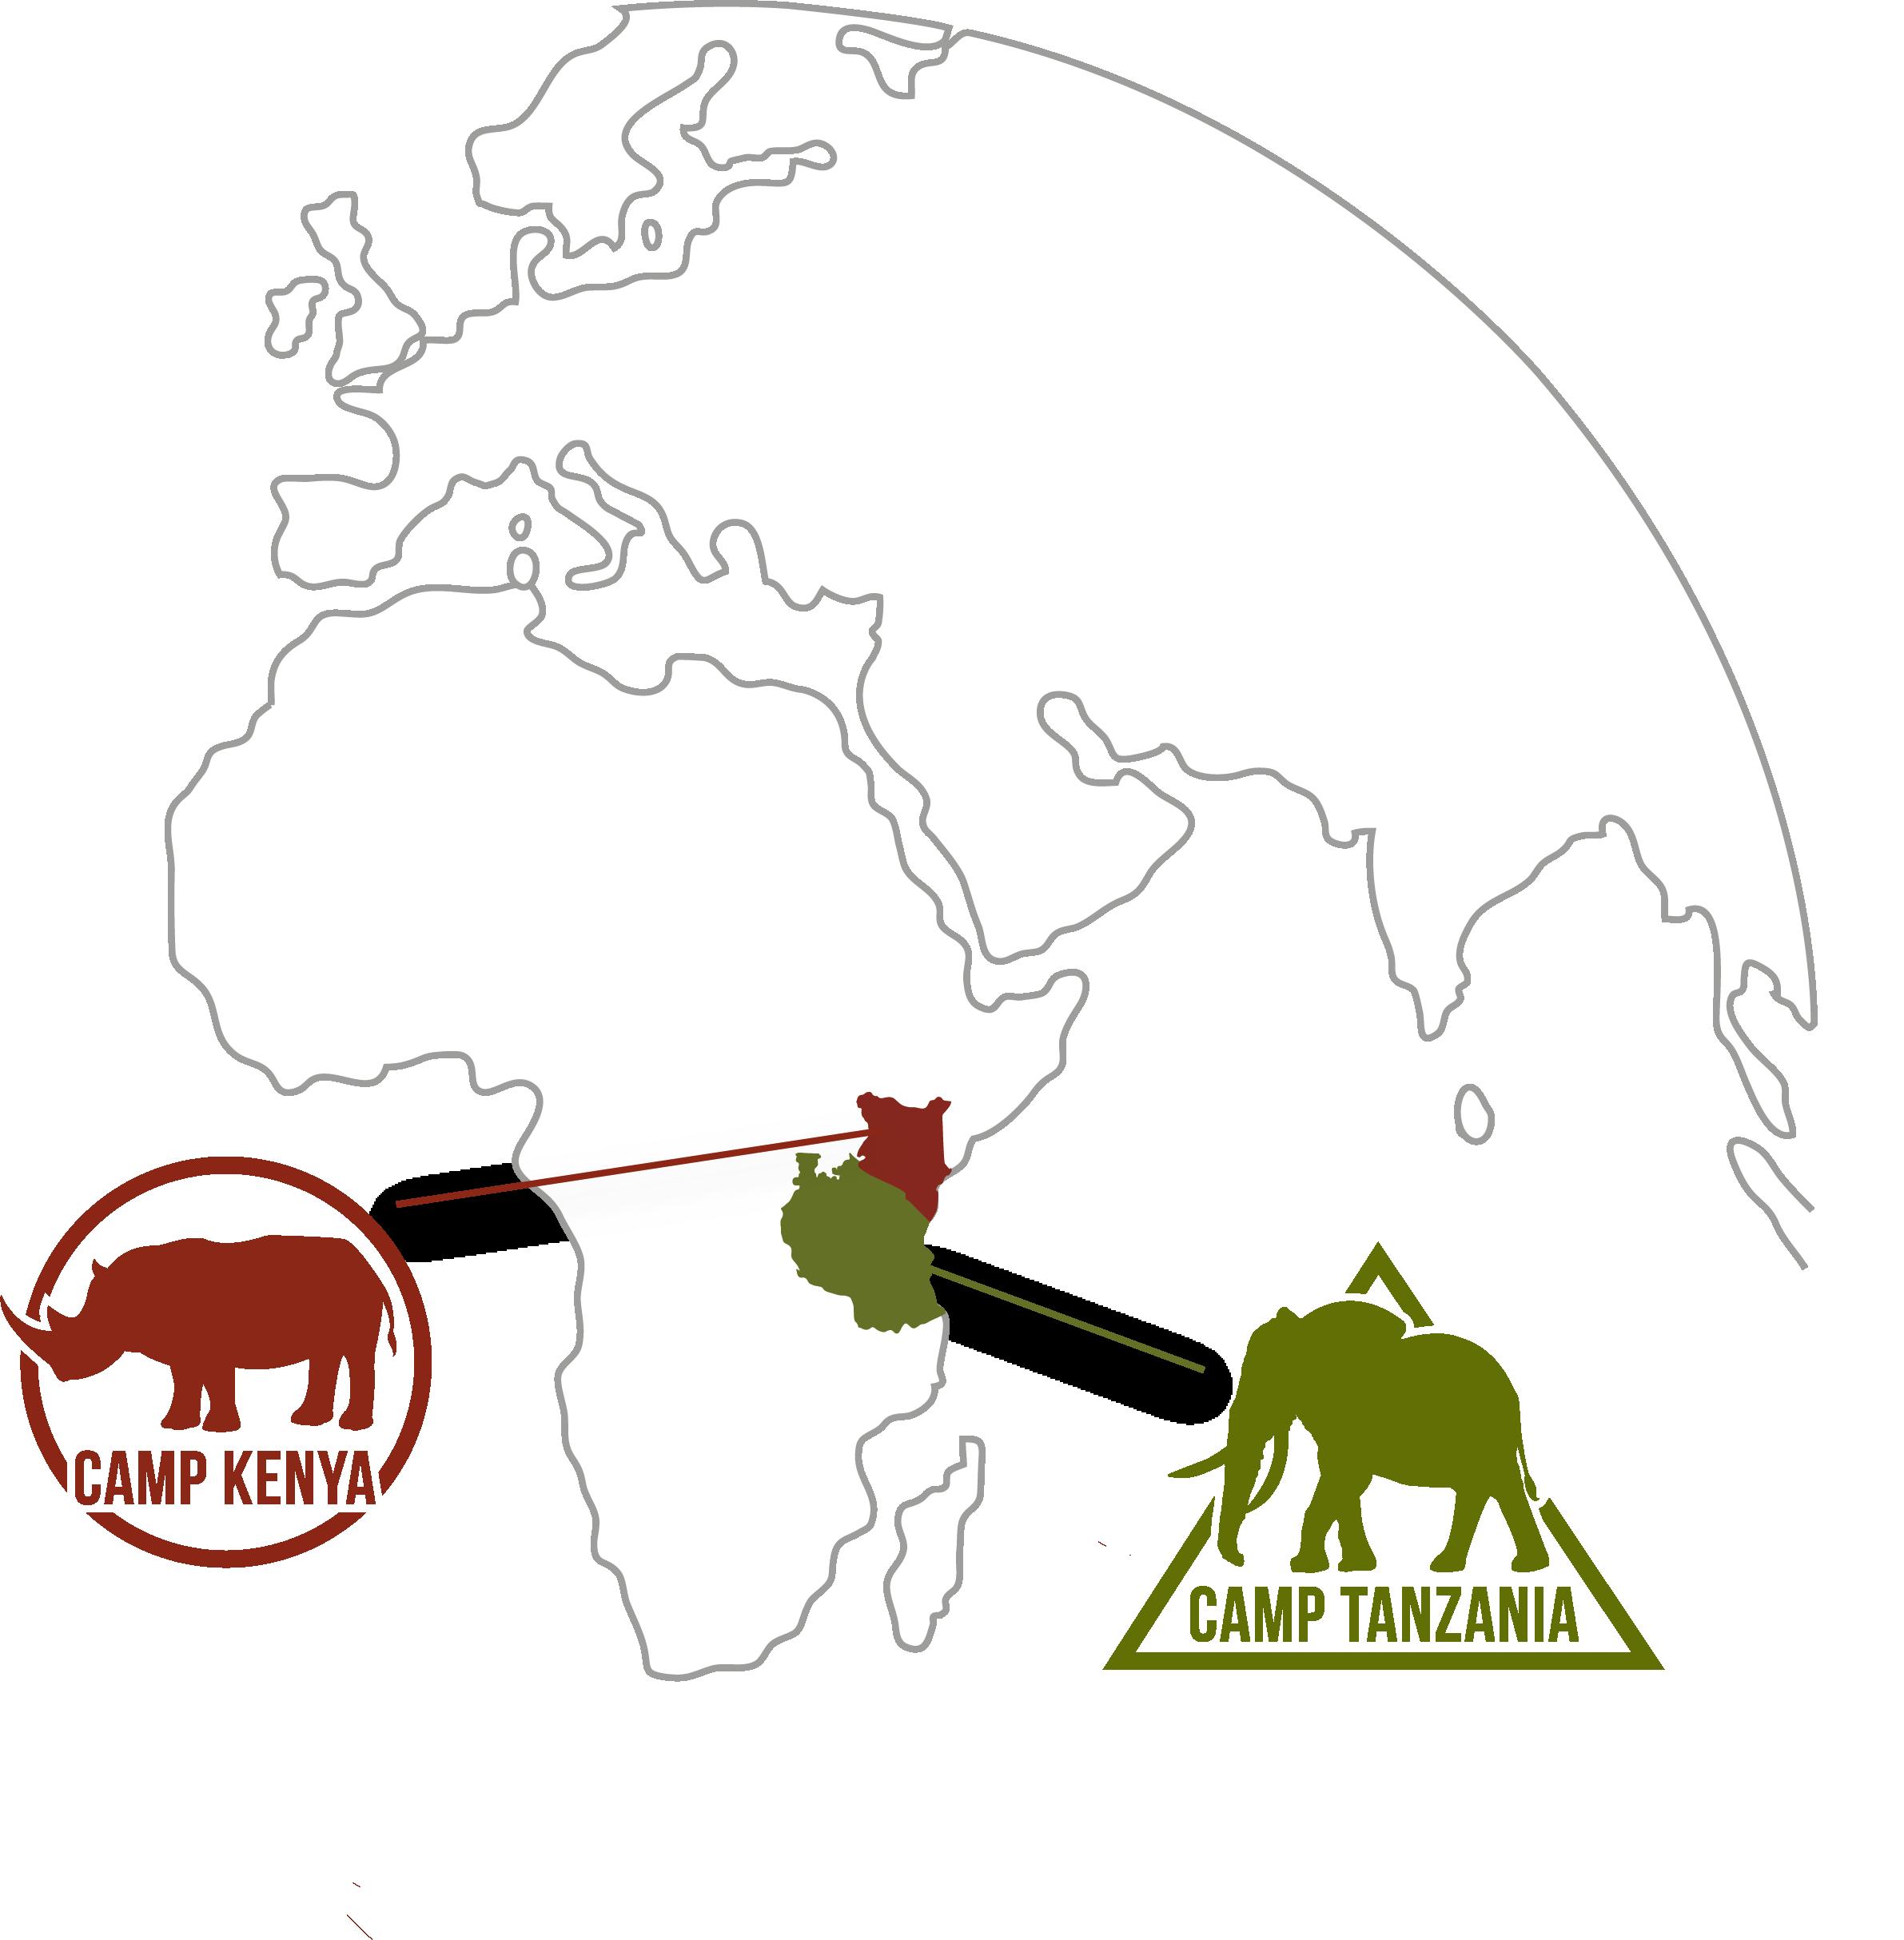 camps_international_kenya_tanzania_round_map-2